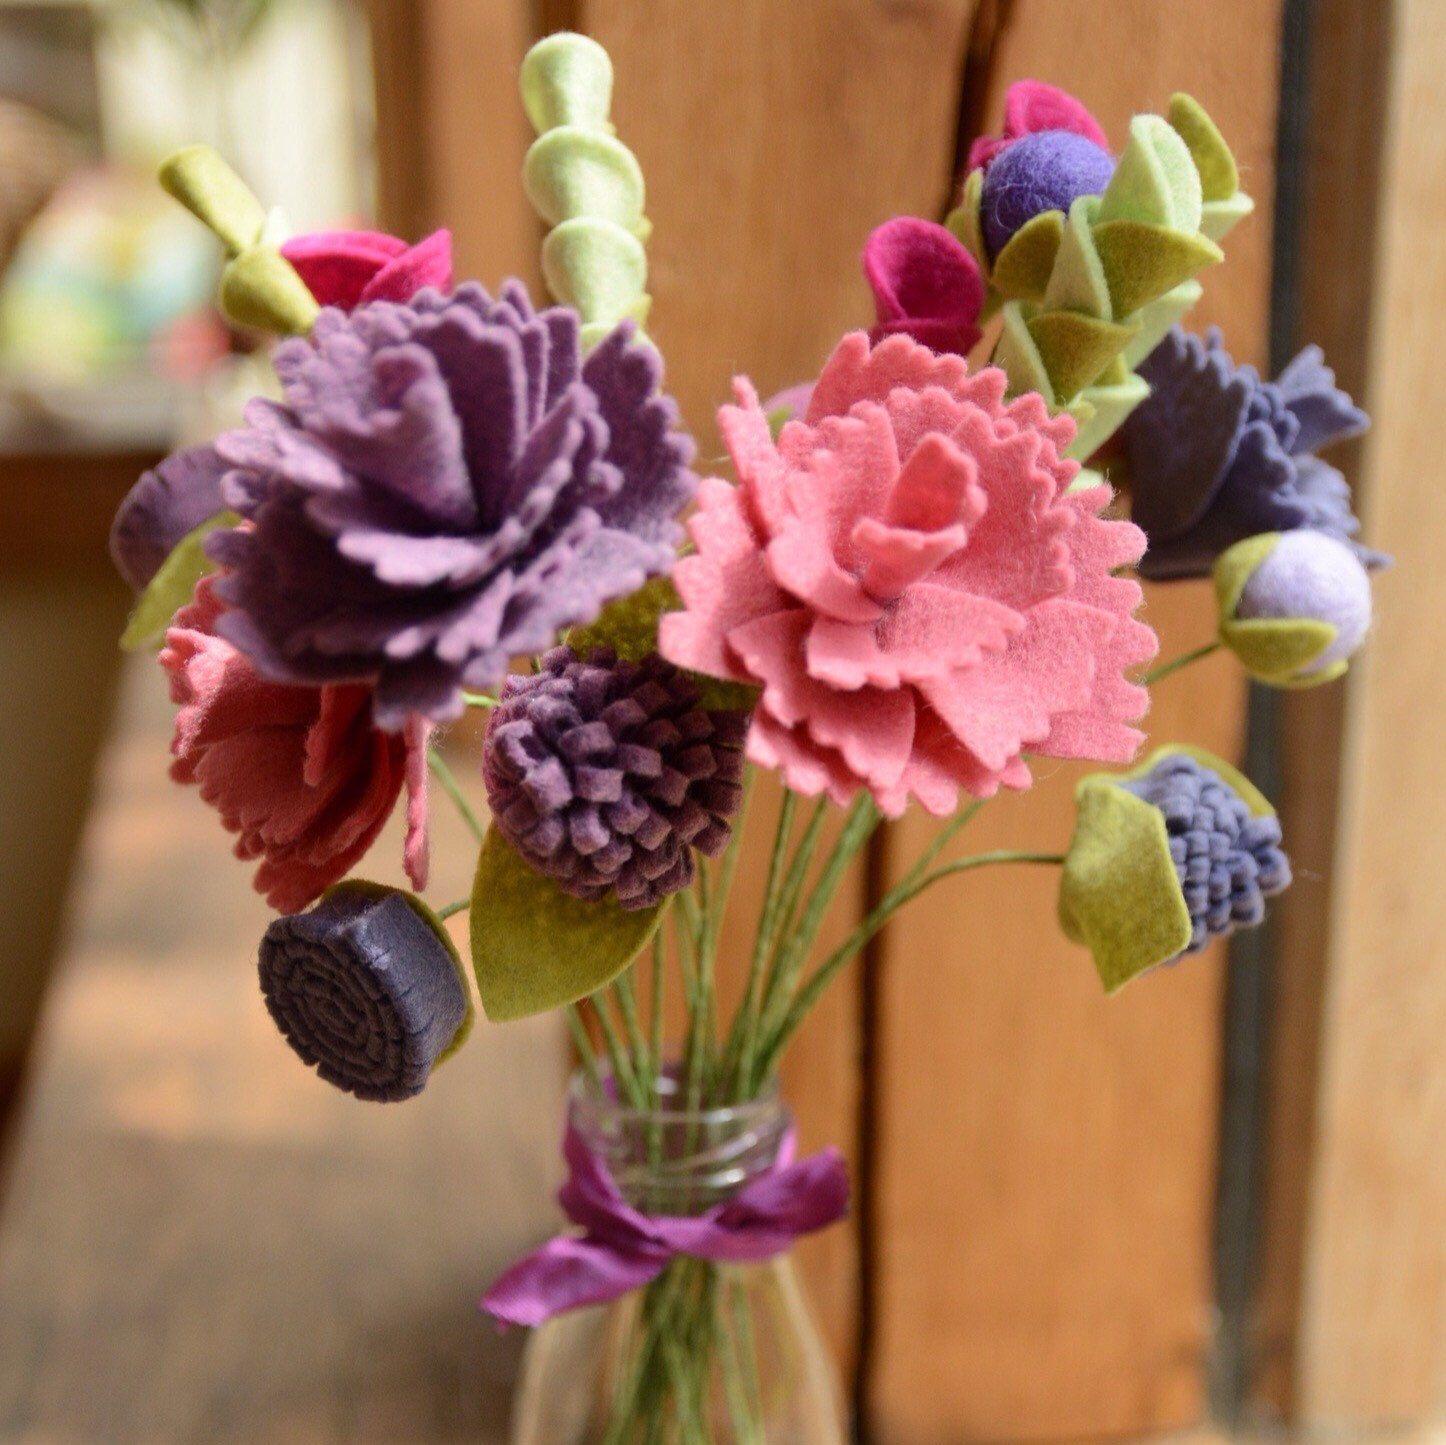 Craft kit diy felt peony flower bouquet filts pinterest peony craft kit diy felt peony flower bouquet izmirmasajfo